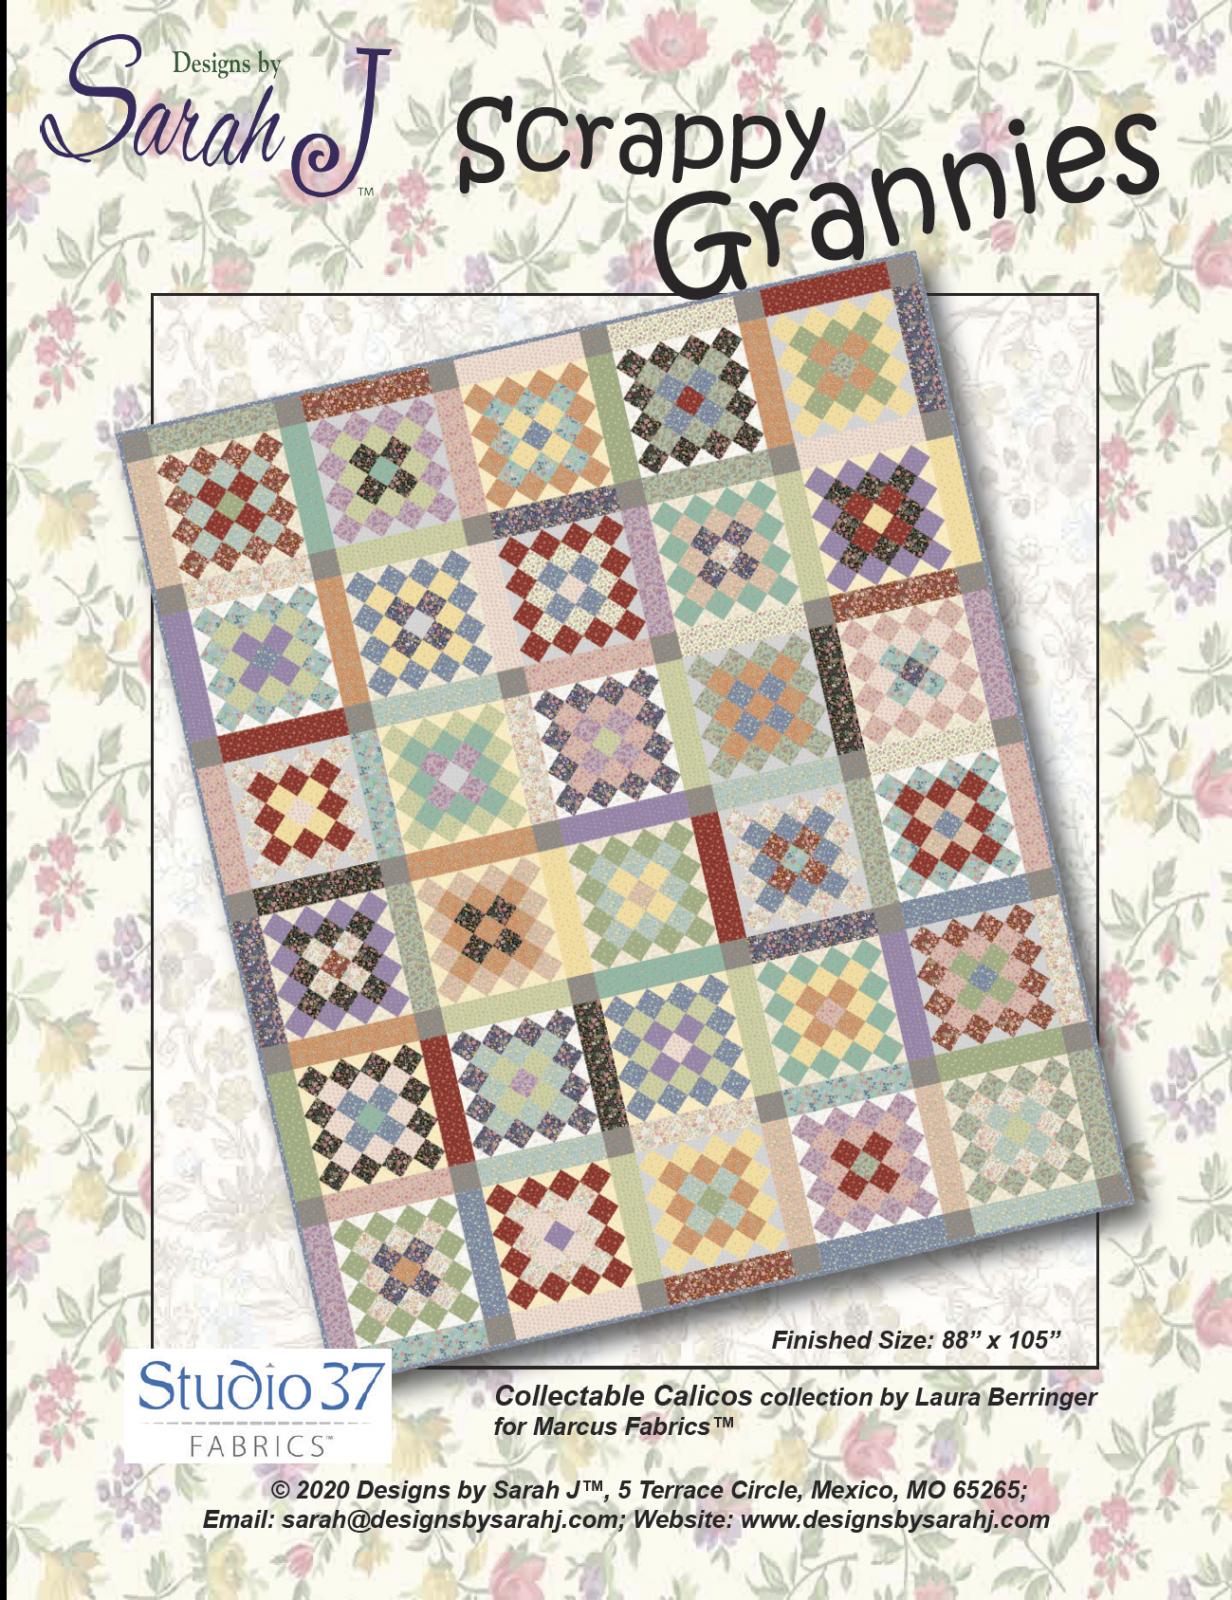 Scrappy Grannies